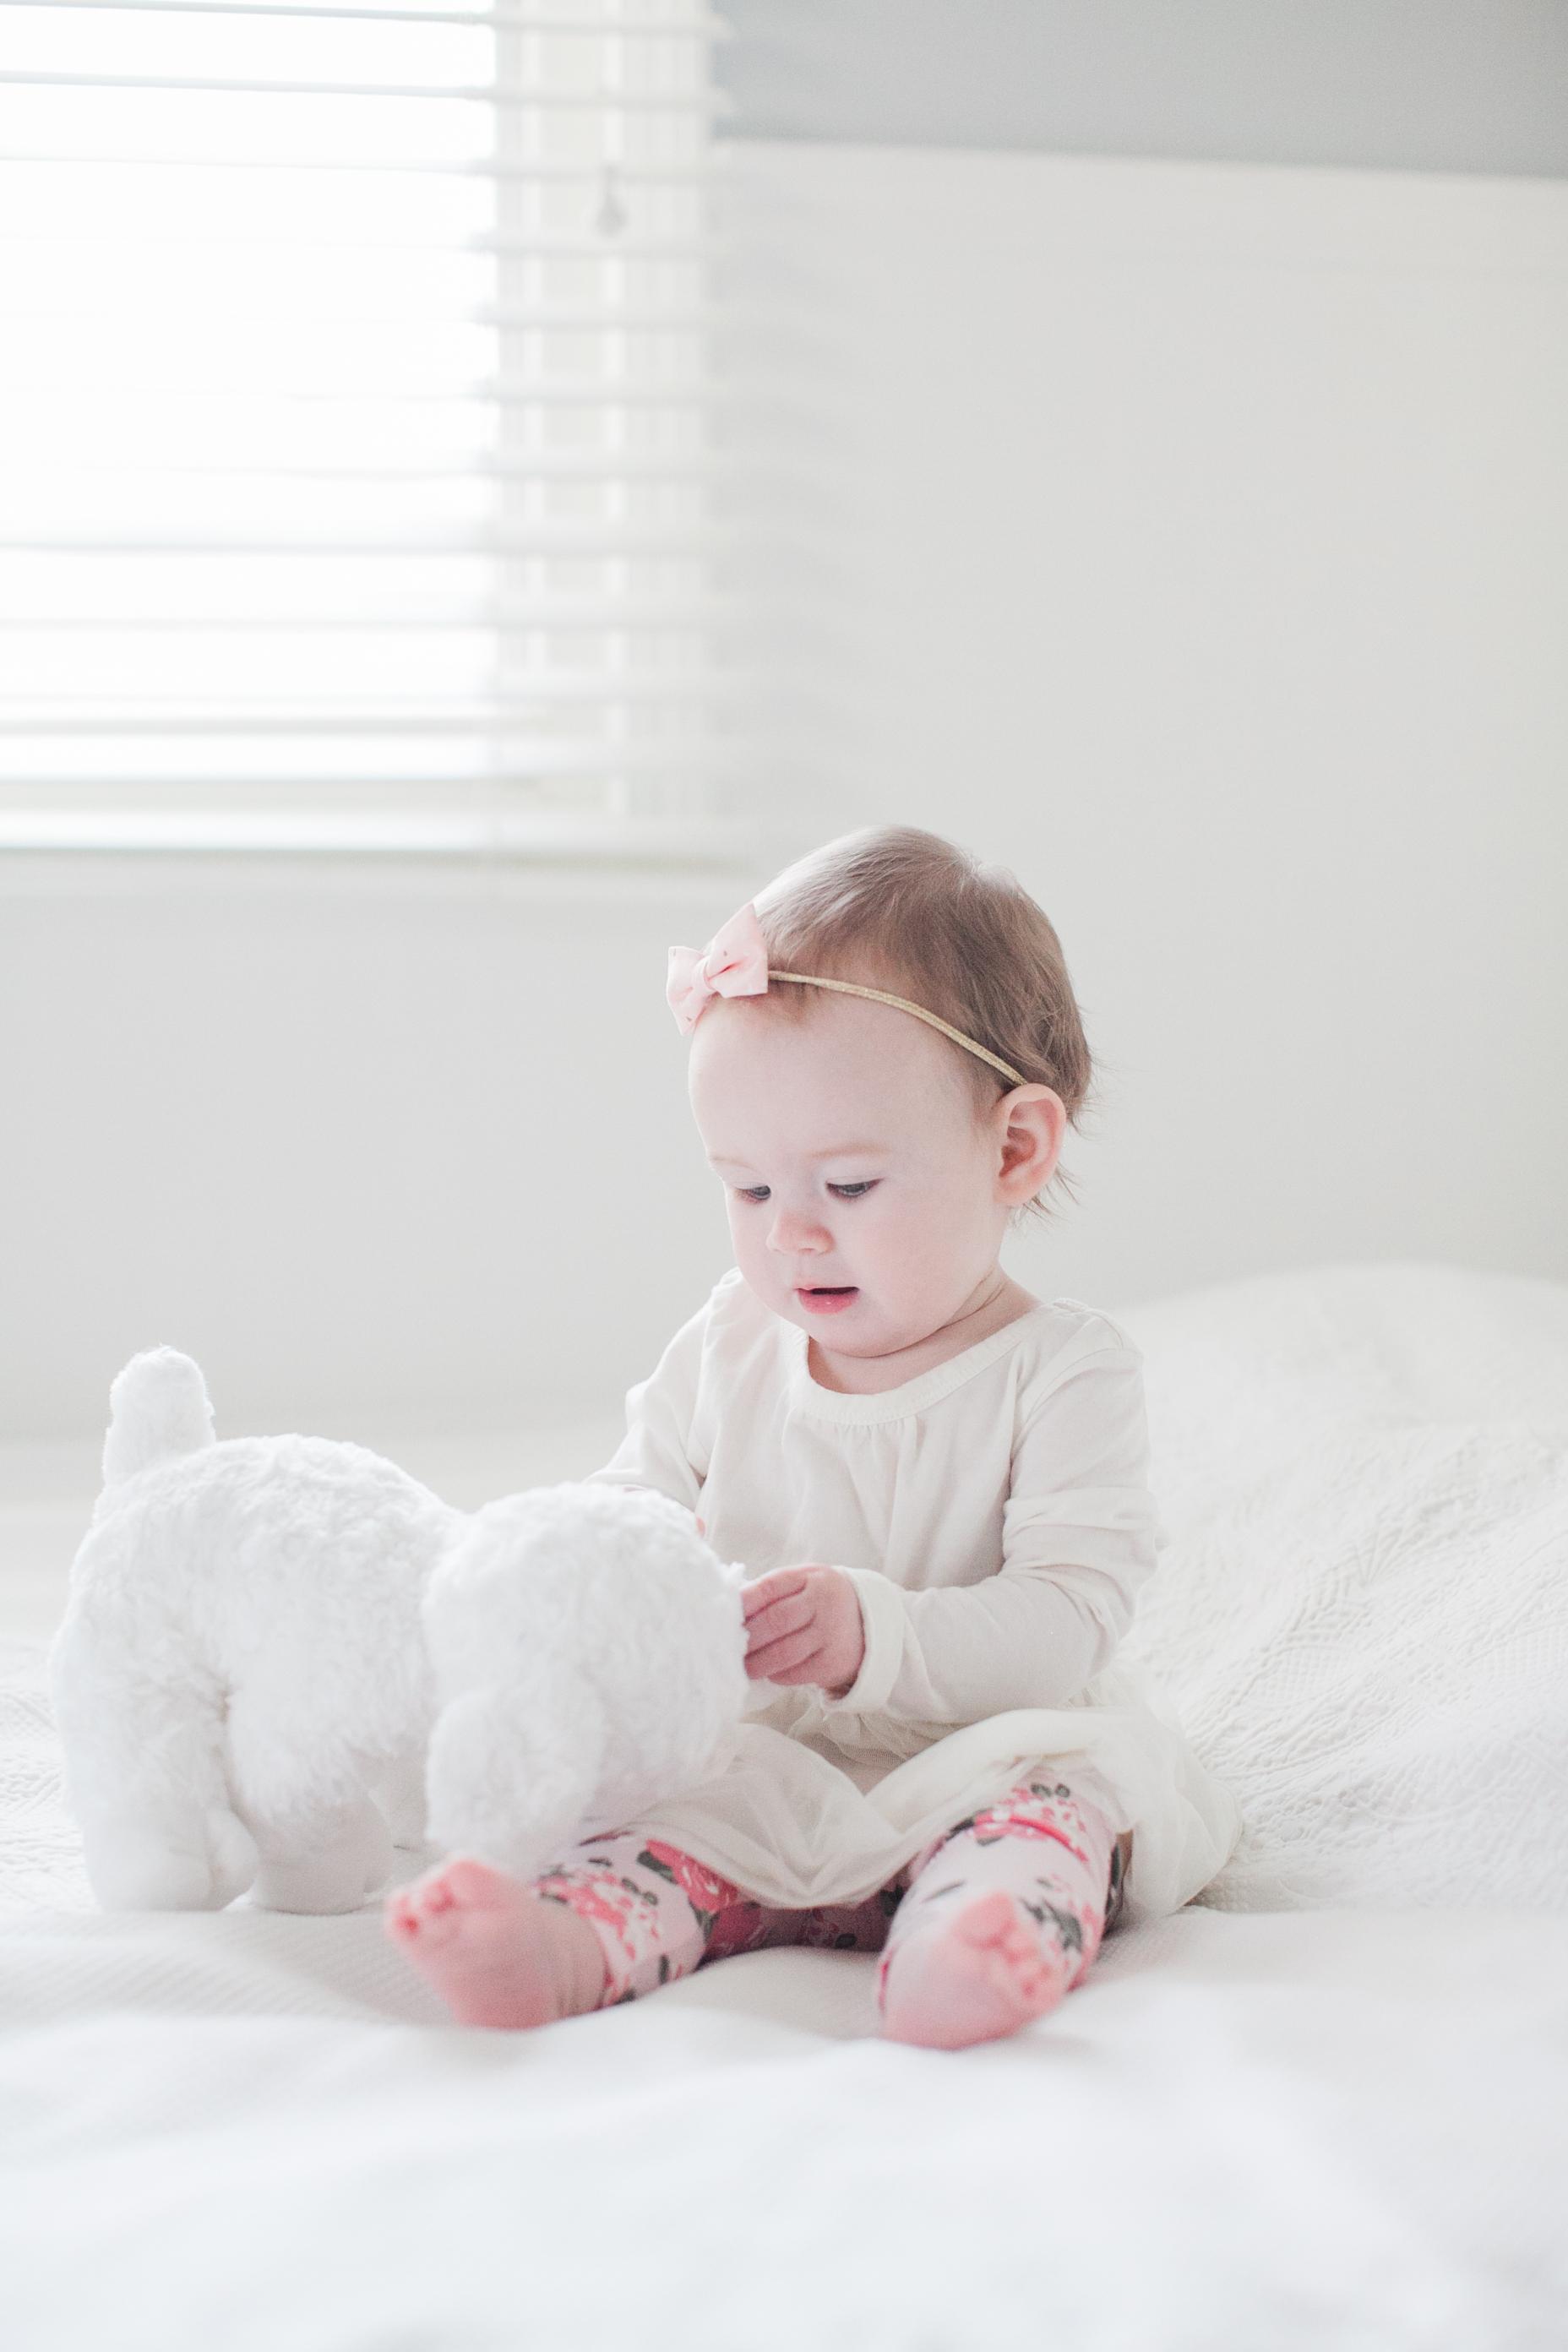 April-12-2017-Ella-10-months-4737.jpg